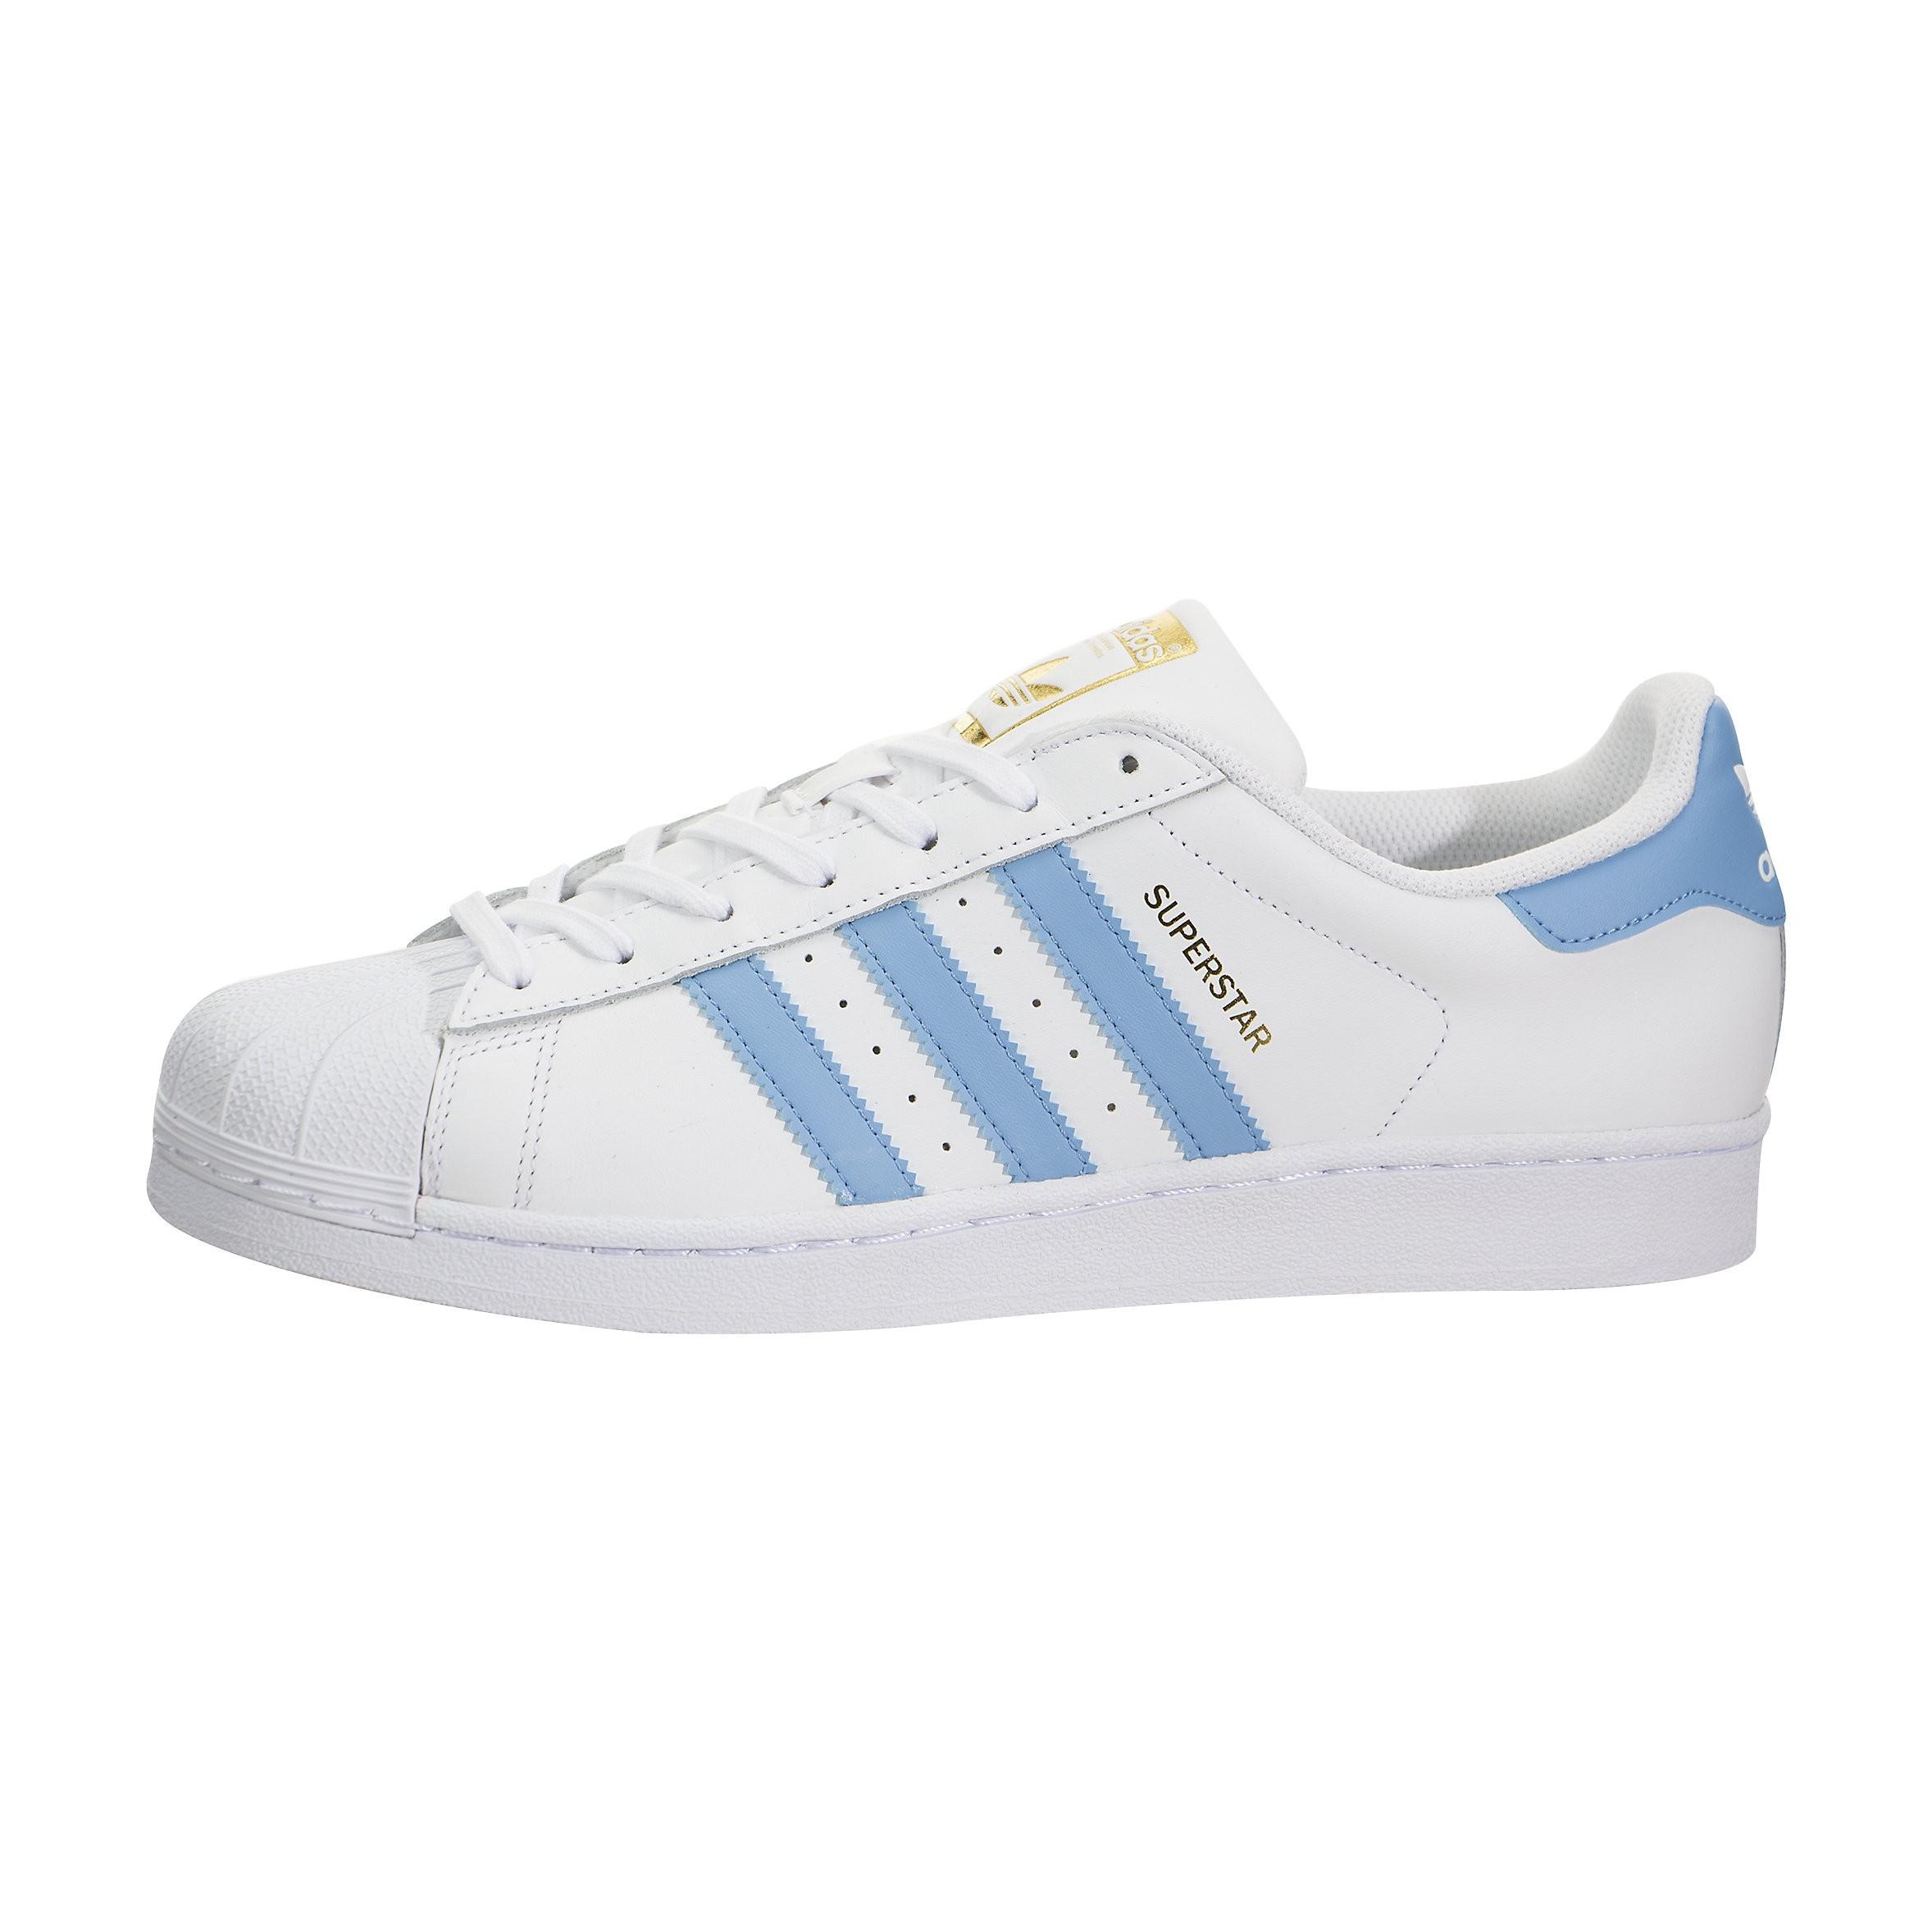 adidas Superstar Foundation Blancas Azules Hombre By3716